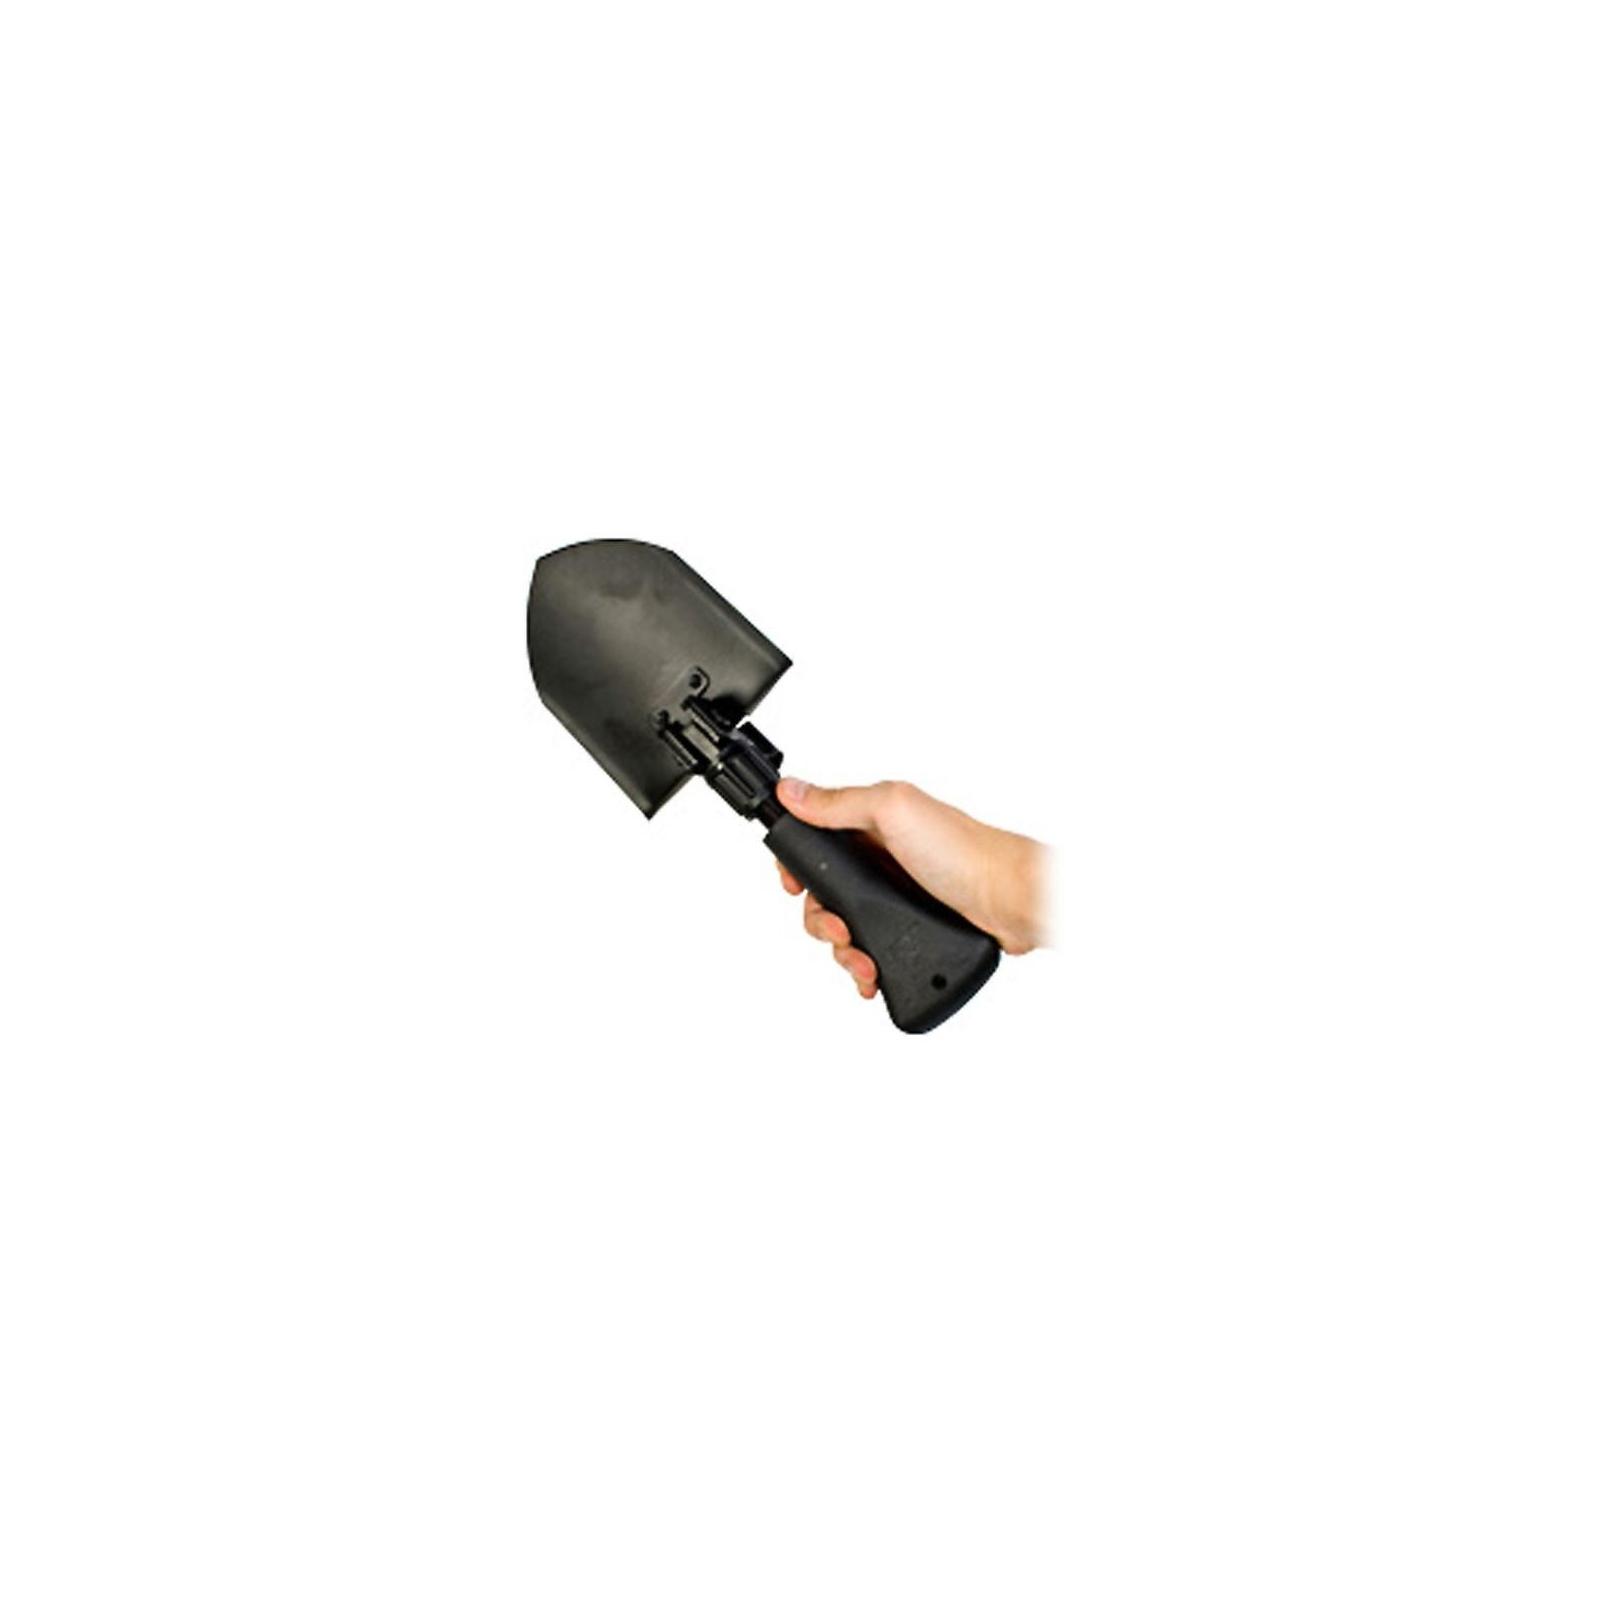 Лопата Gerber Gorge Folding Shovel (22-41578) изображение 6